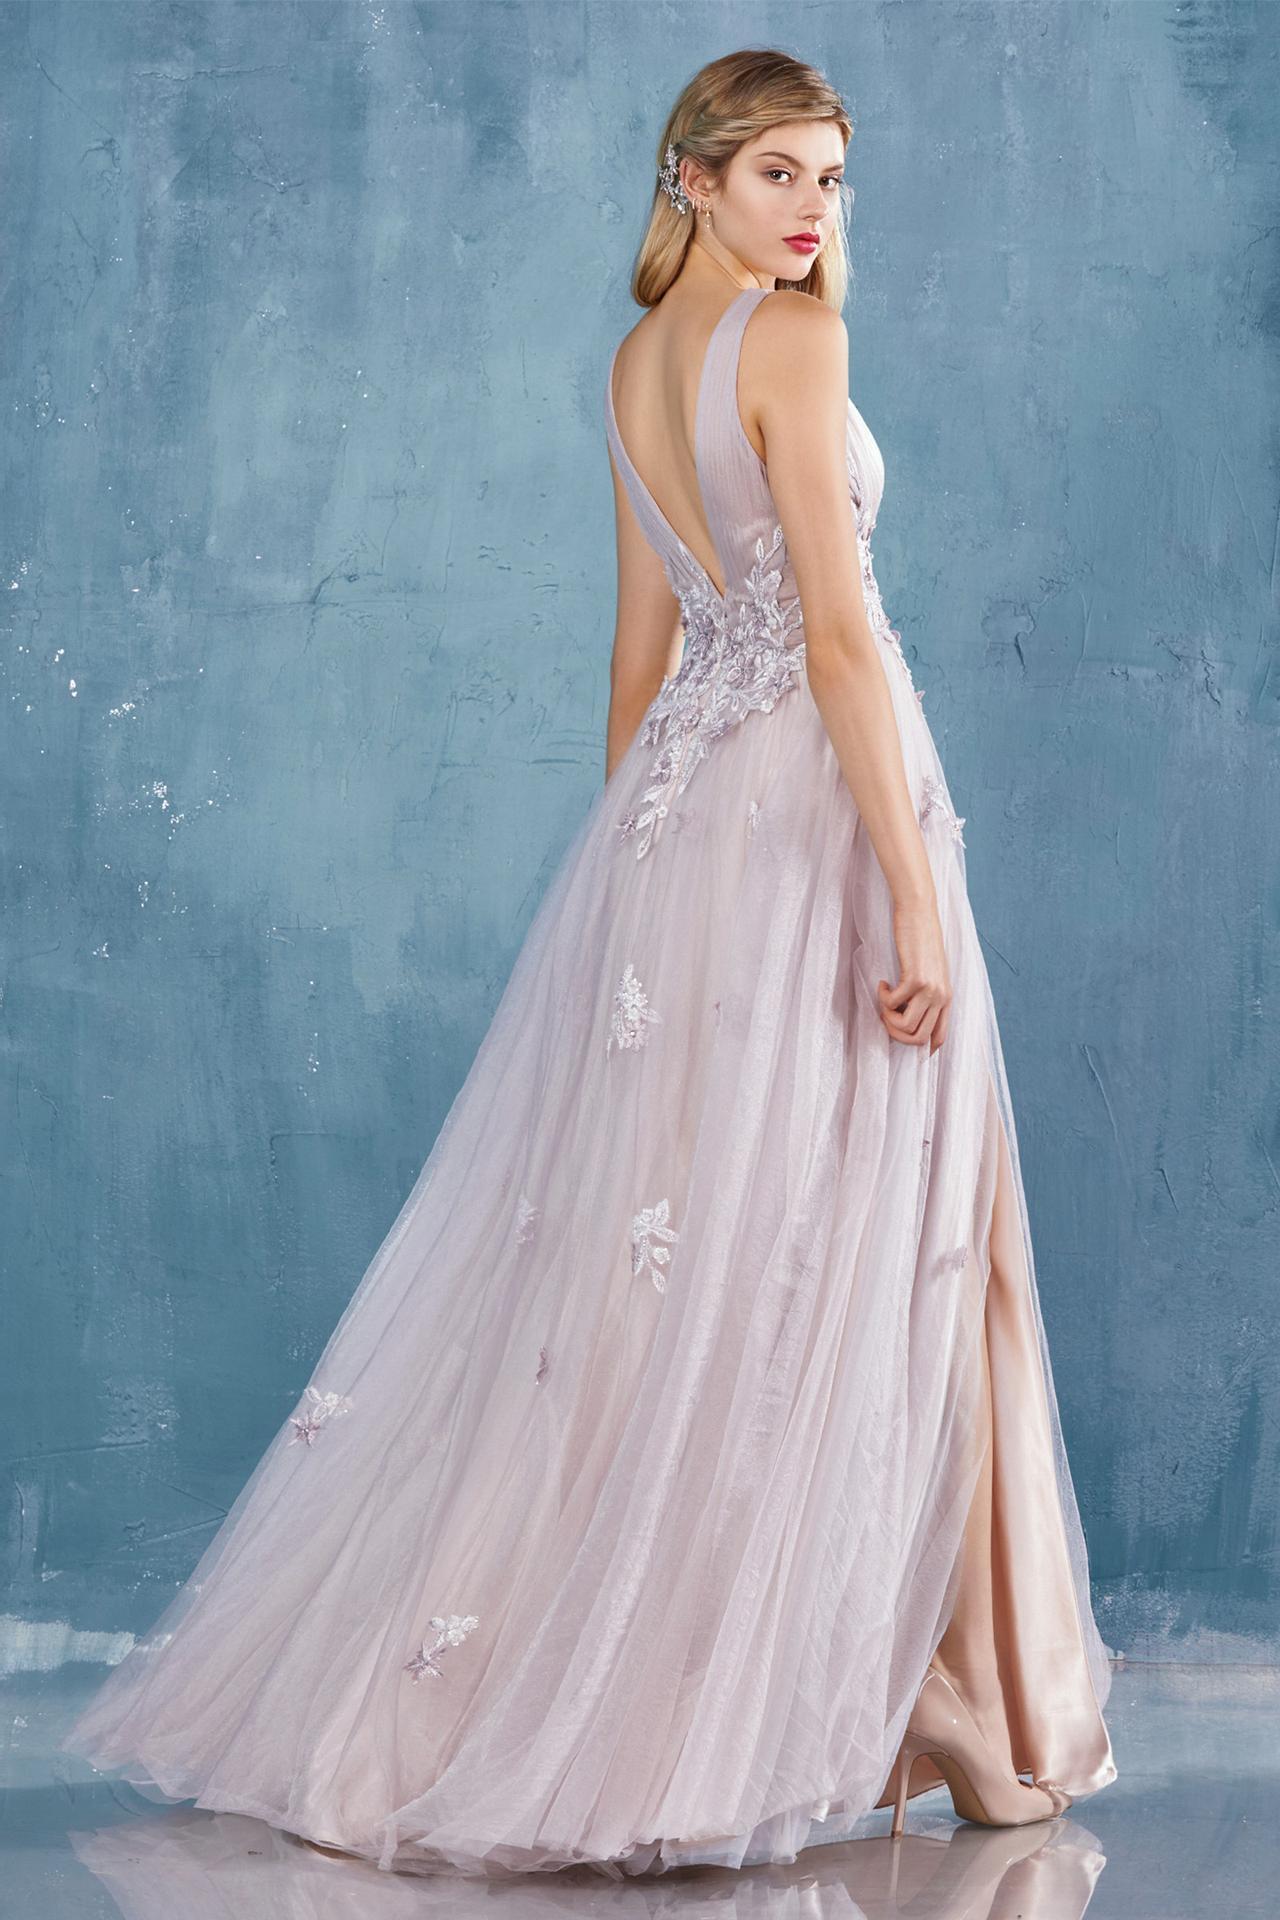 Nové spoločenské šaty :) - Obrázok č. 41